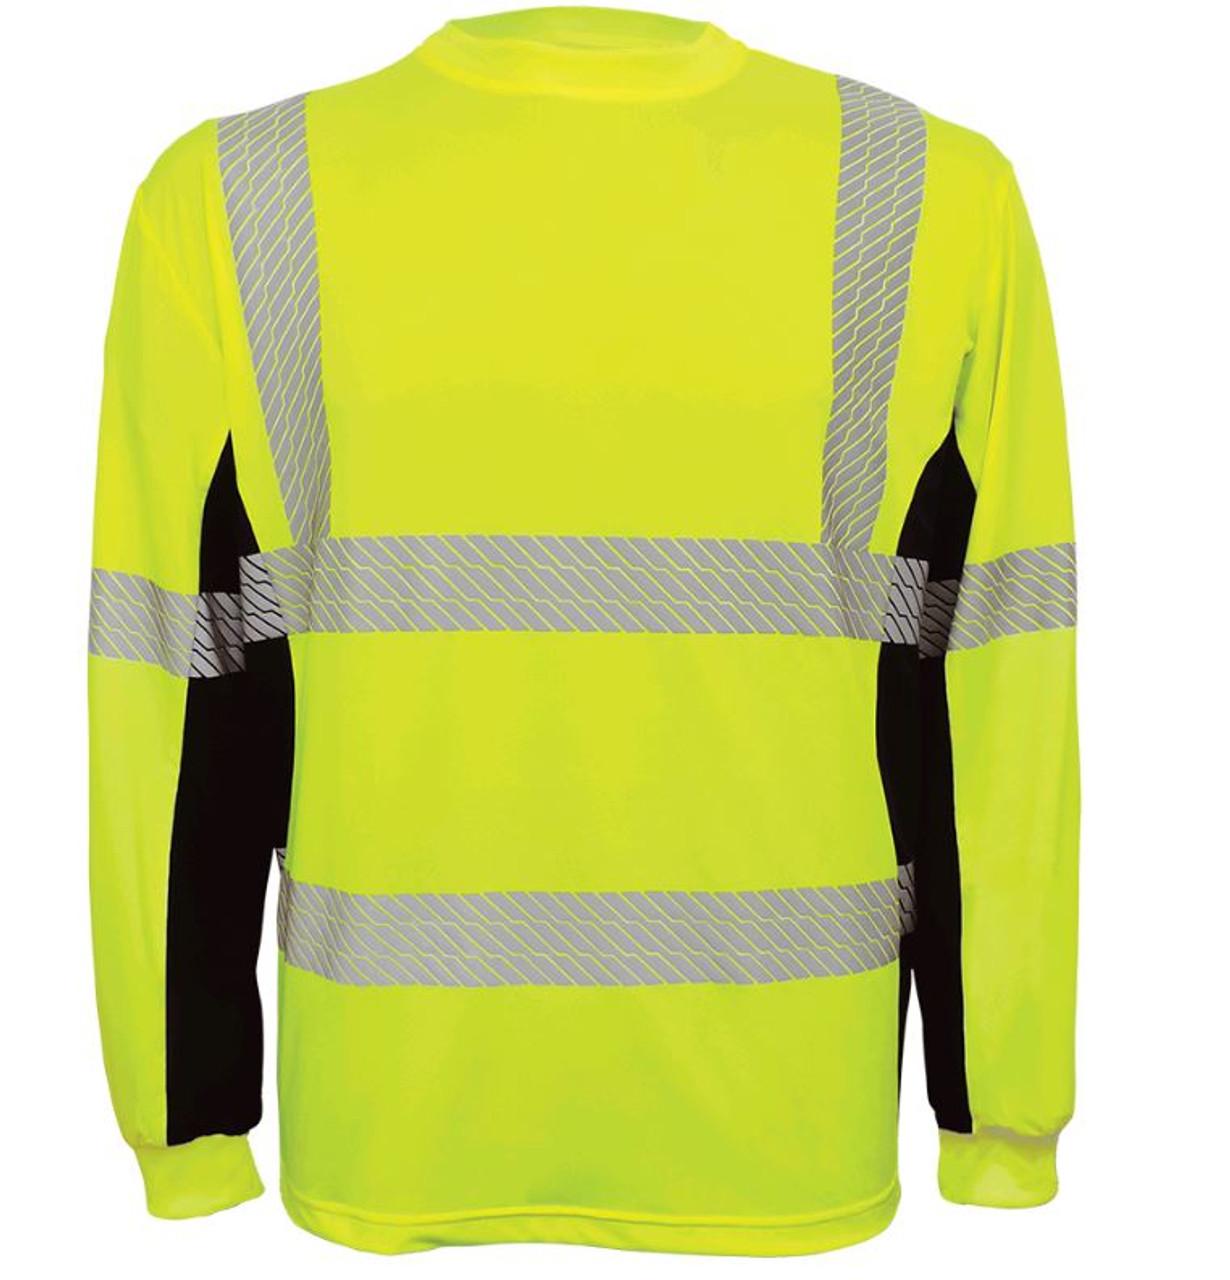 Global Glove GLO-225LS - FrogWear HV - High-Visibility High Performance Stretch Shirt